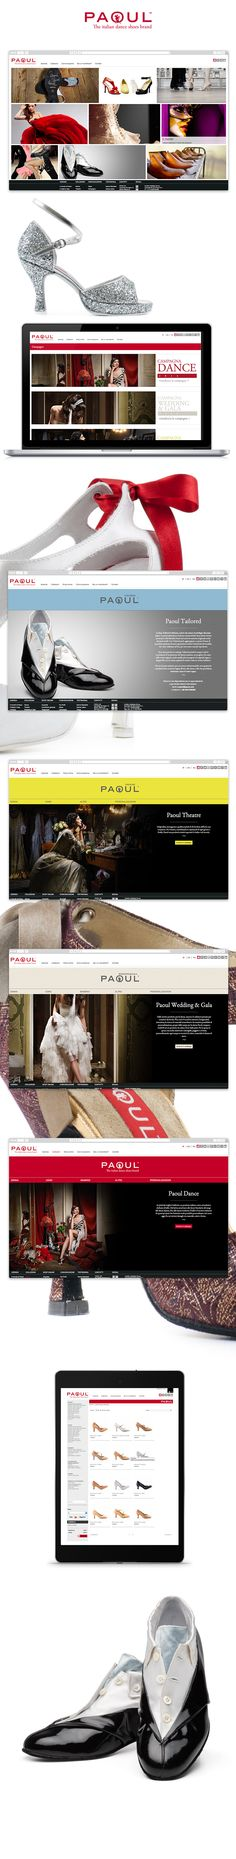 Sito web Calzaturificio Paoul creato da effADV - Calzaturificio Paoul #website, created by effADV - #webdesign #graphicdesign #weblayout #web #graphic #shoes #photography